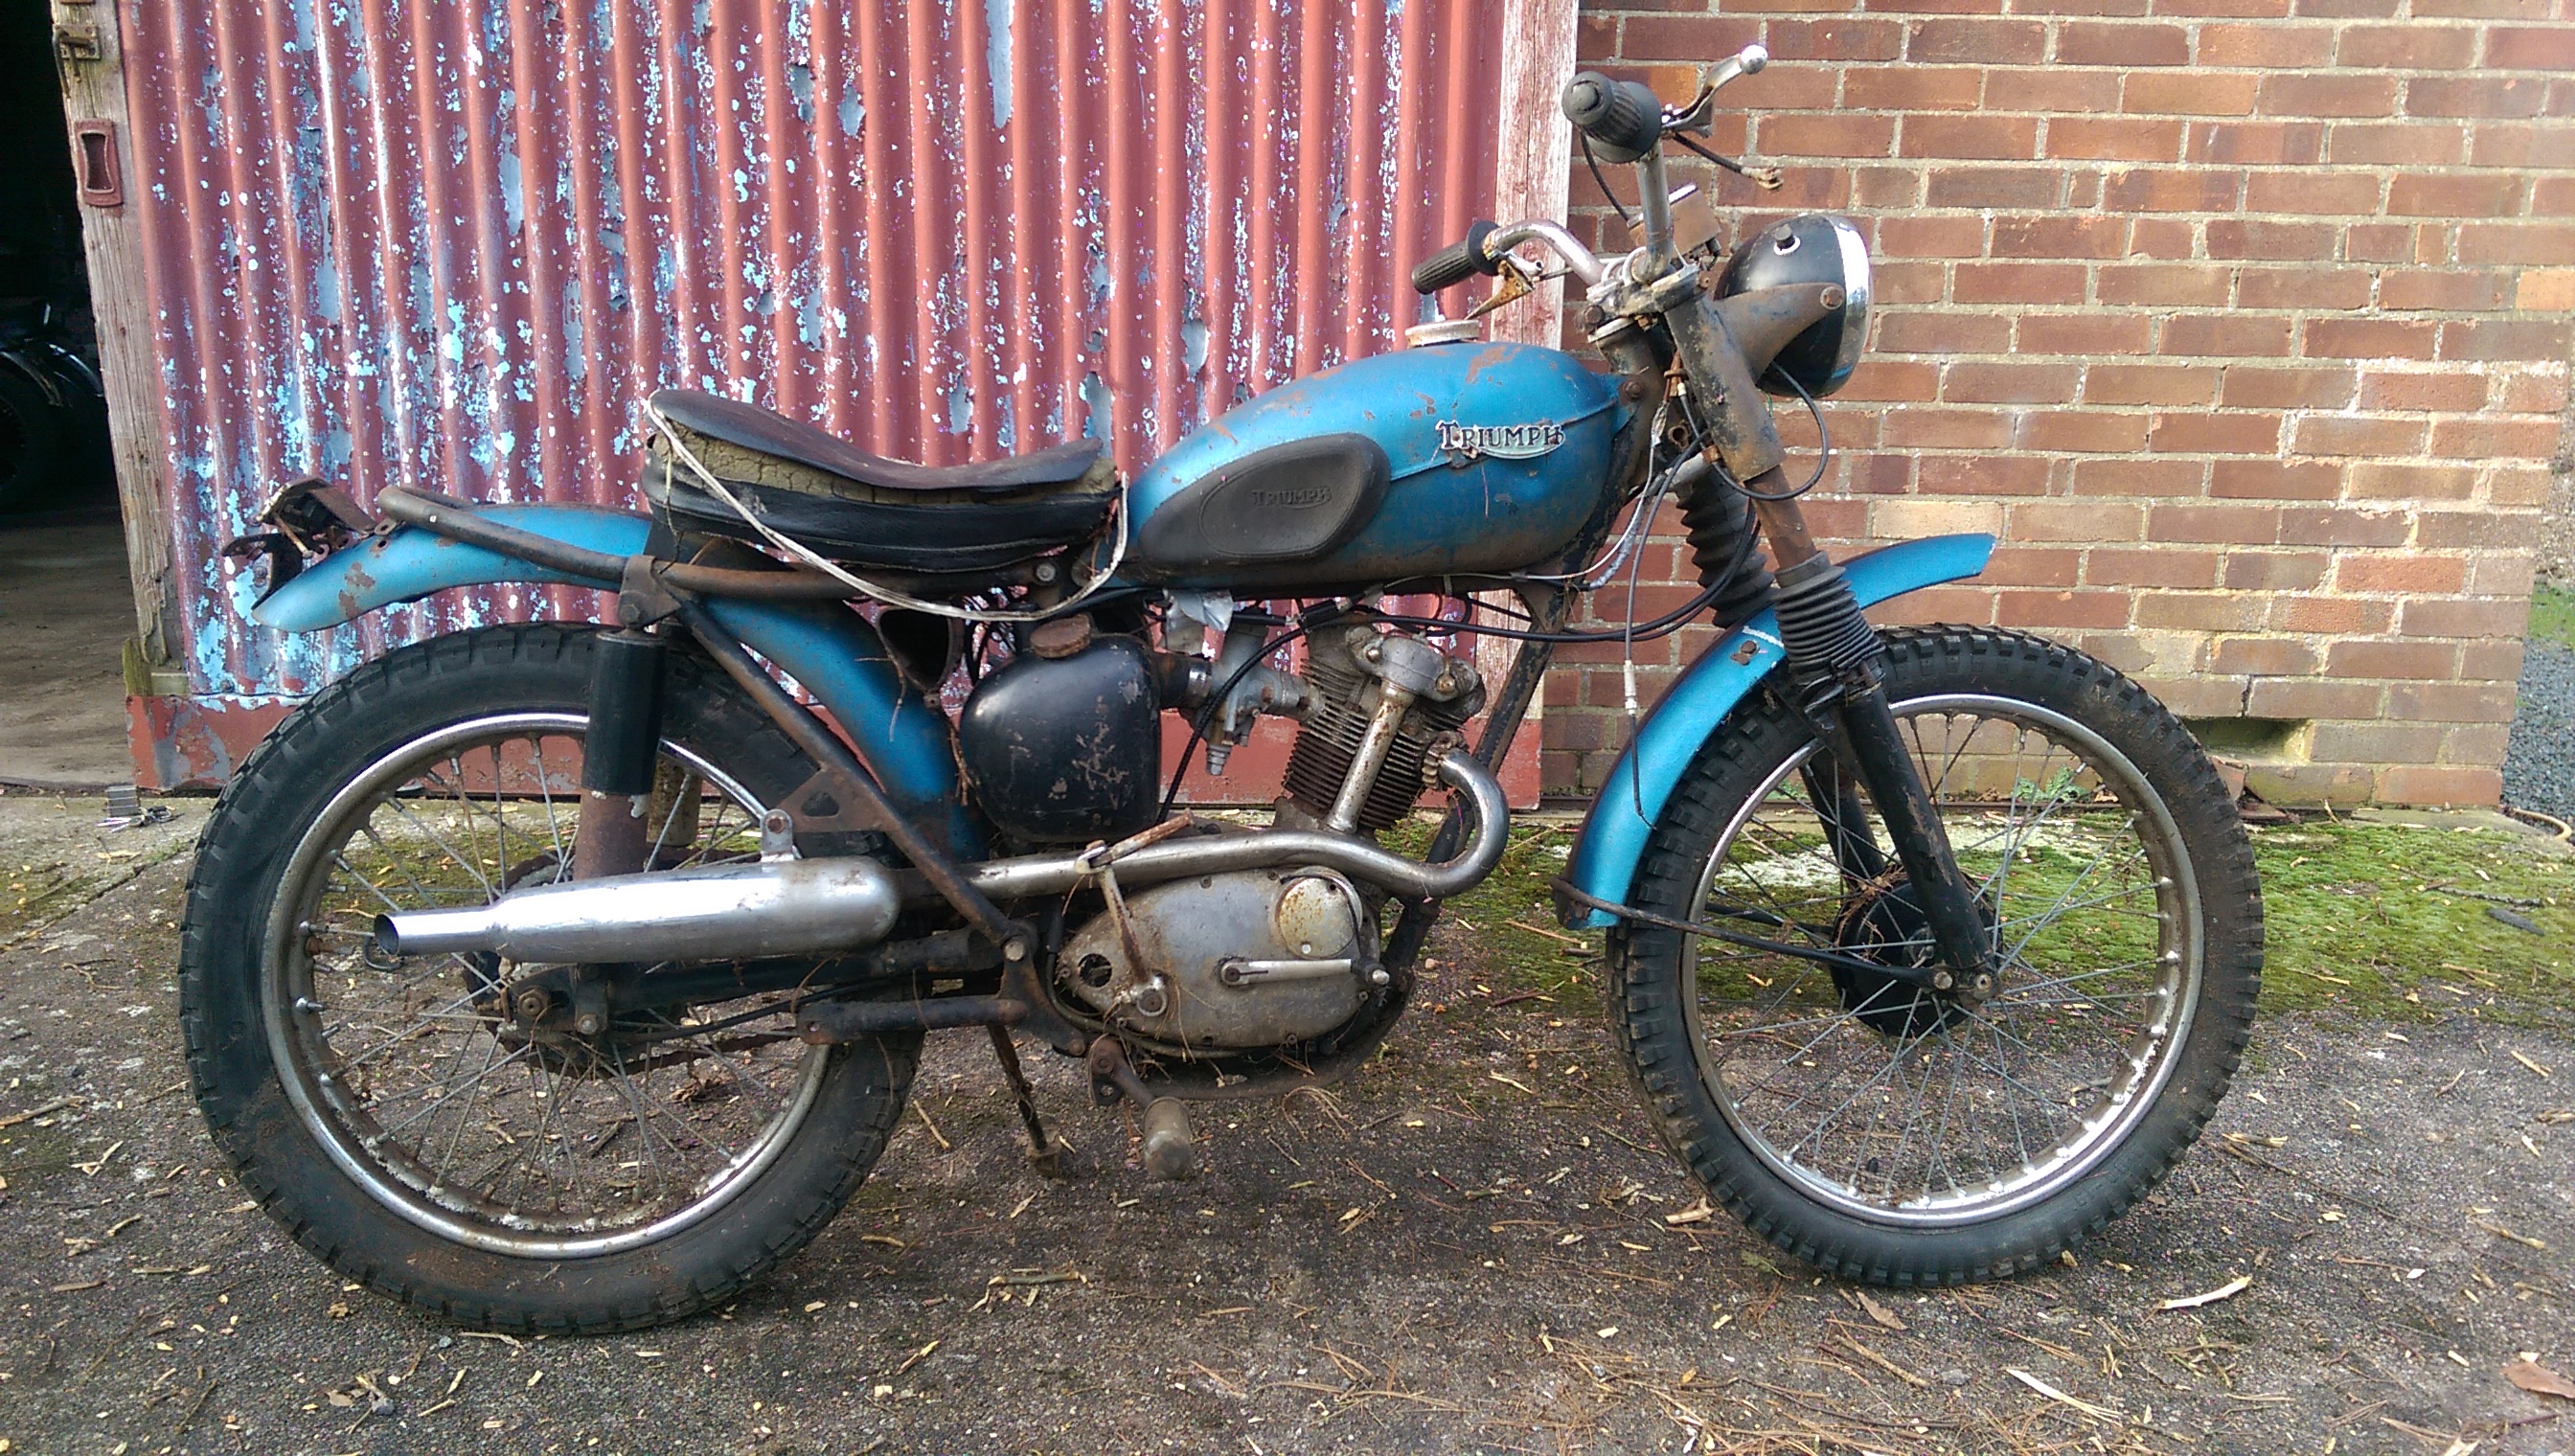 Barn Find Motorcycles Classic Bikes For Restoration Burton Bike Bits